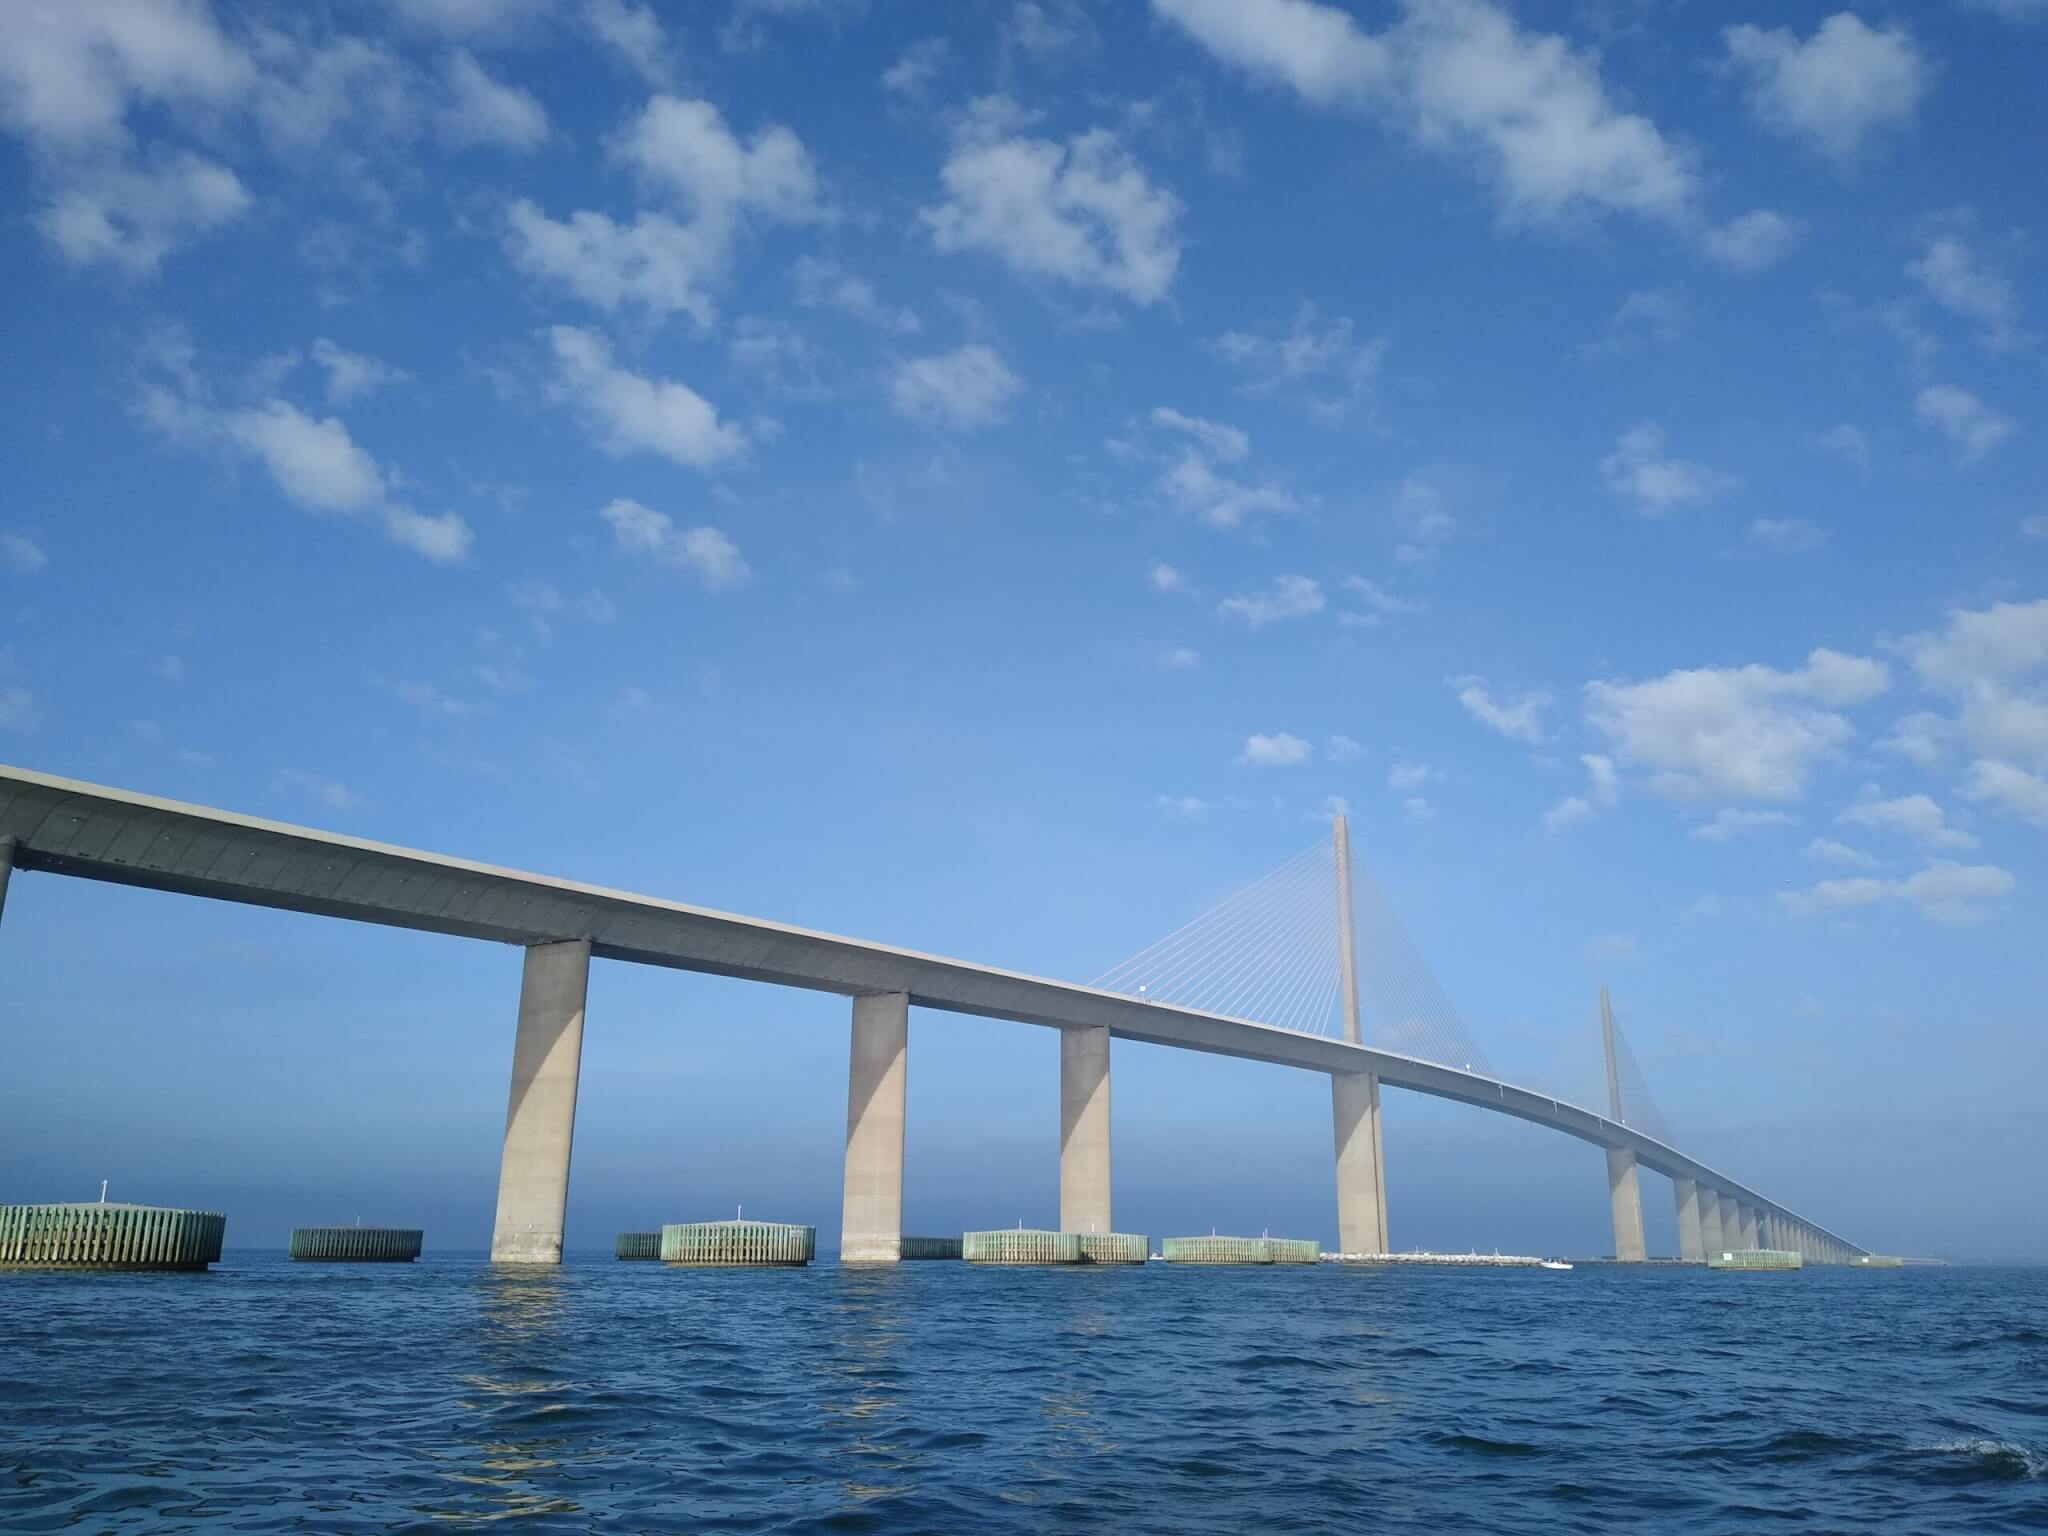 SR-55 (I-275) Sunshine Skyway Bridge Repairs & Rehabilitation, Bridge #150189 over Tampa Bay